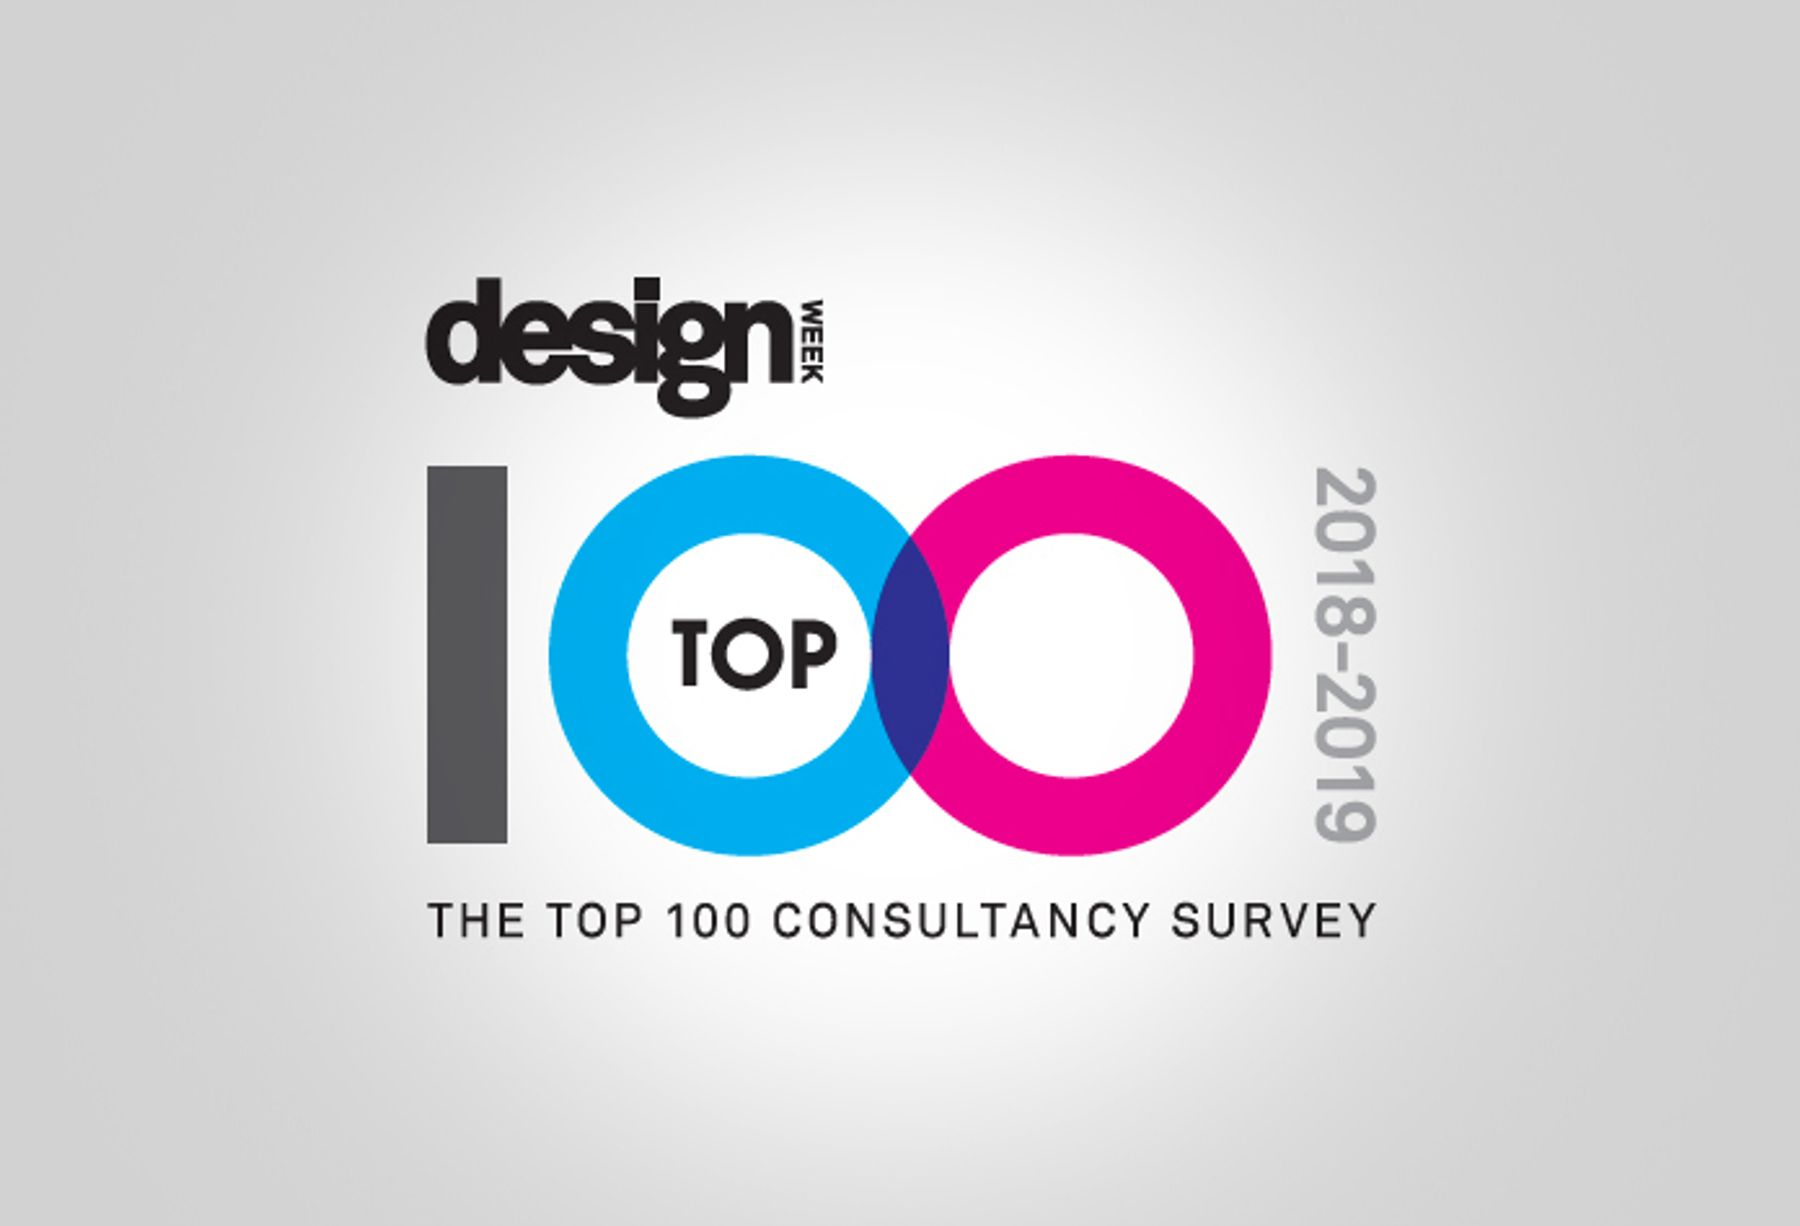 Design week top 100